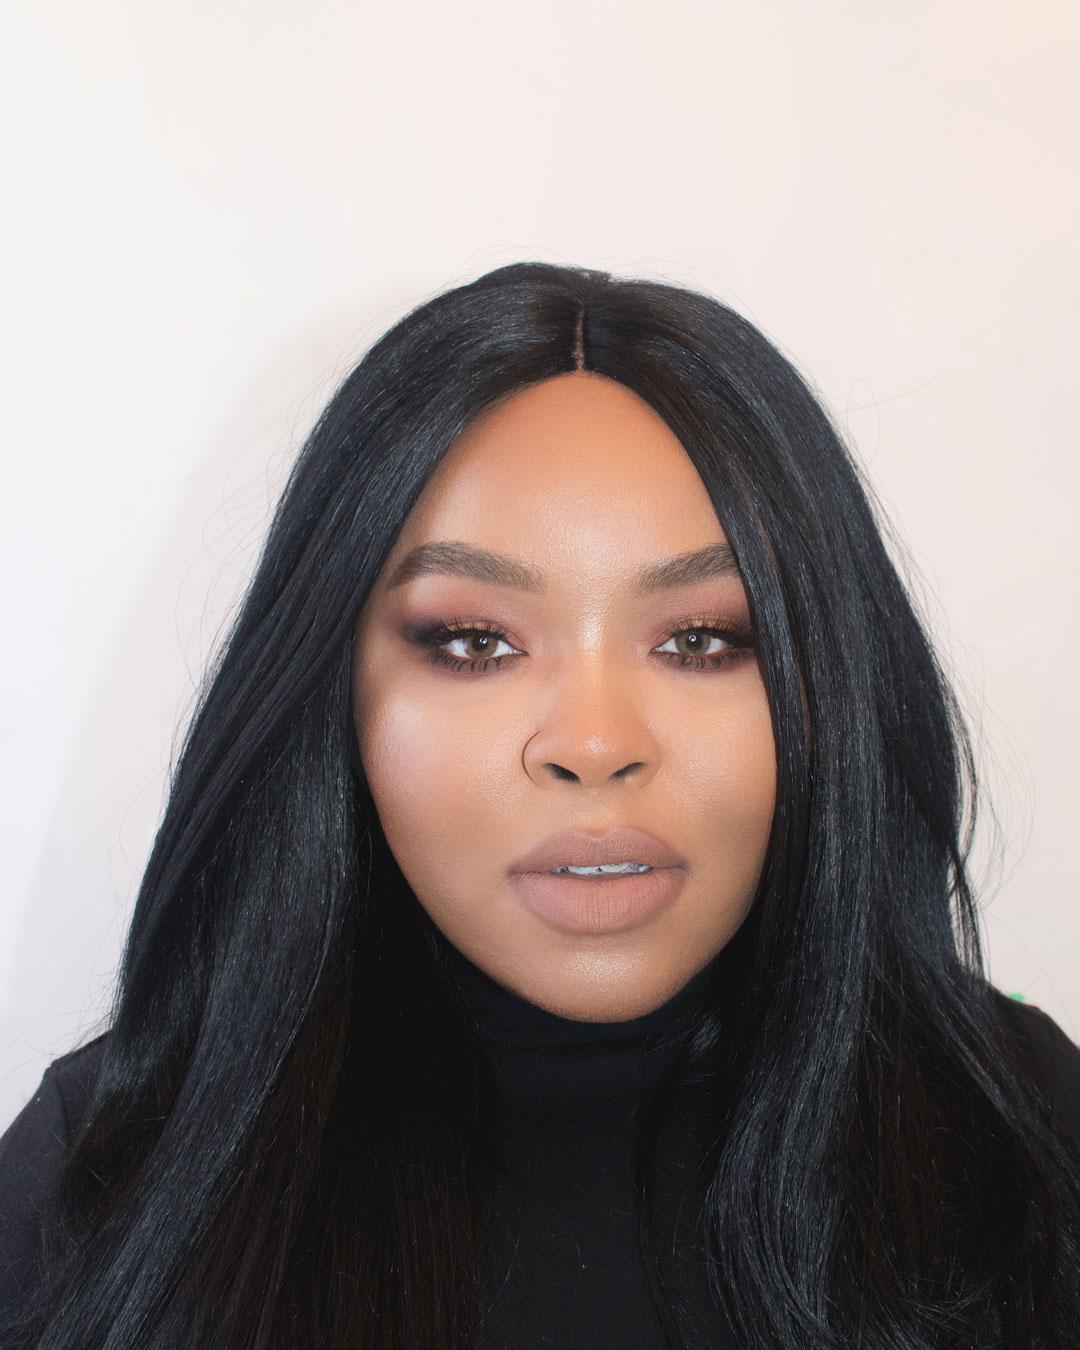 Anastasia Beverly Hills Amrezy, ABH Starfish, Neutral Makeup Dark Skin